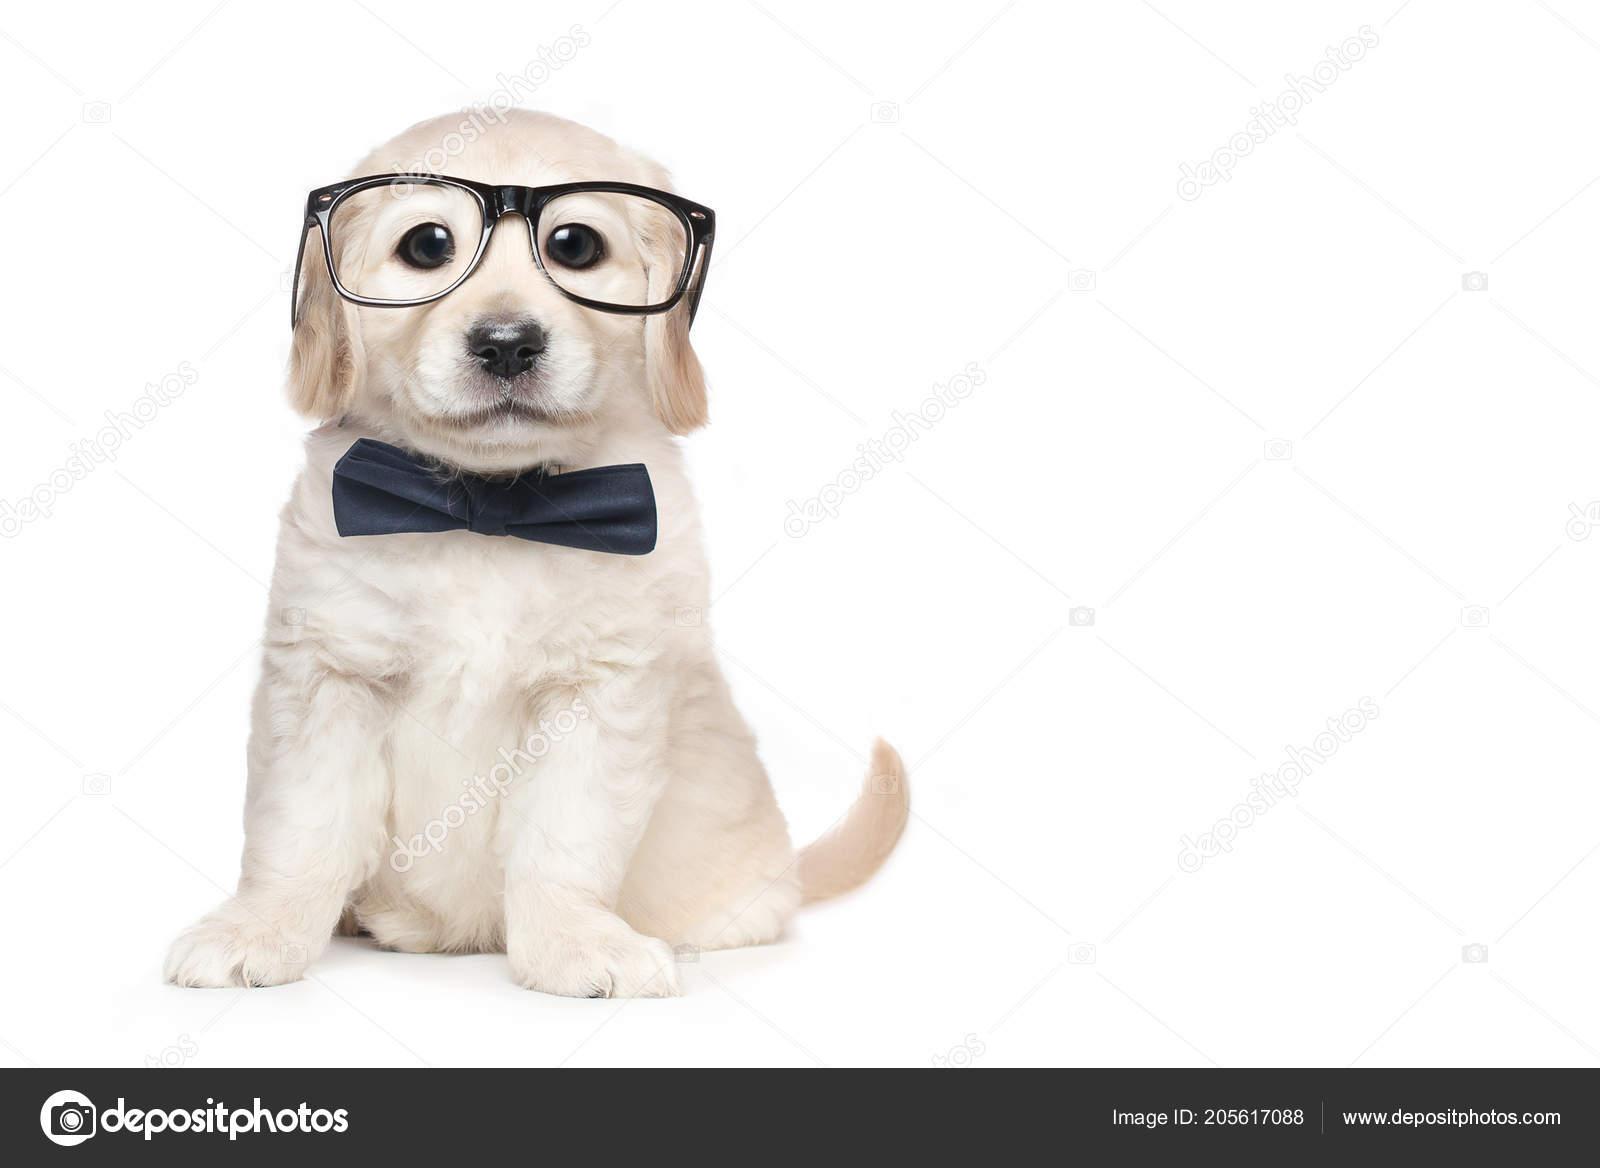 Cute Golden Retriever Puppy Glasses Bow Tie Stock Photo Markez